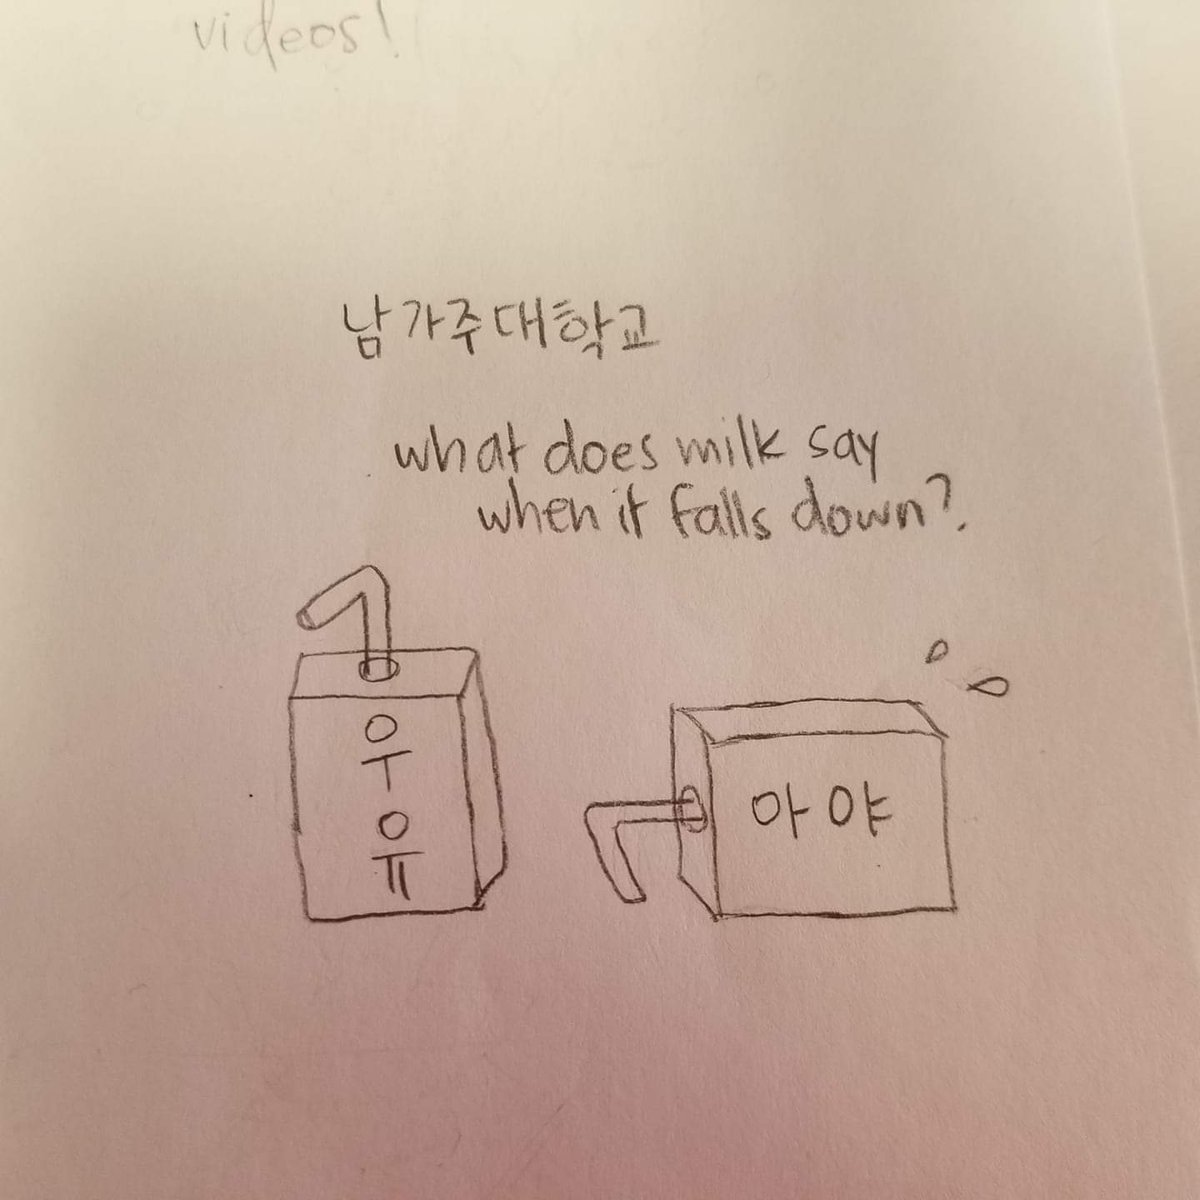 Korean joke by a student from USC Korean class